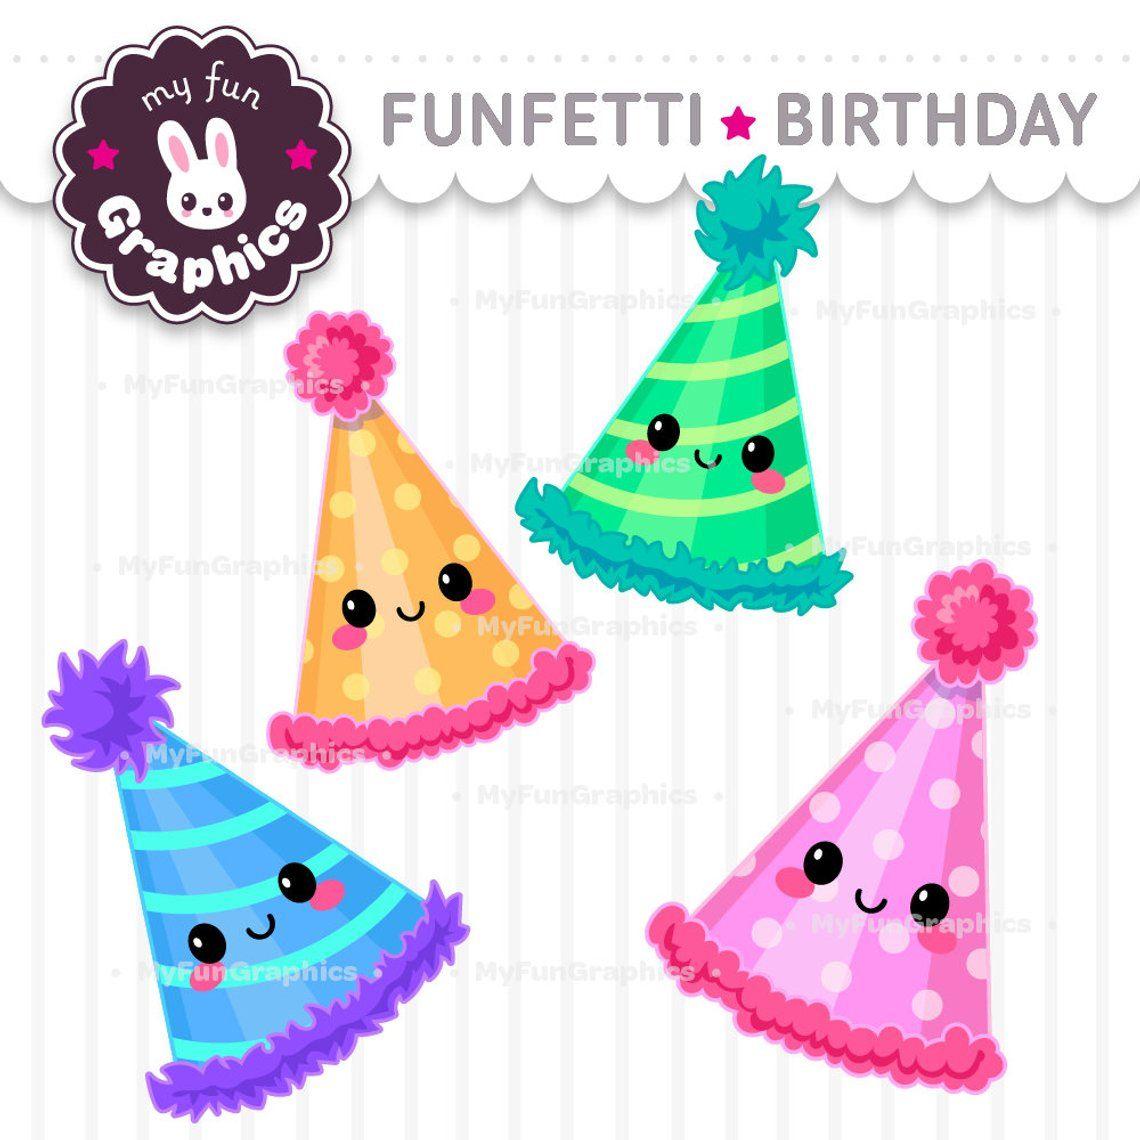 Funfetti Birthday Kawaii Clip Art Cute Birthday Clipart Etsy In 2021 Birthday Clipart Birthday Banner Drawing